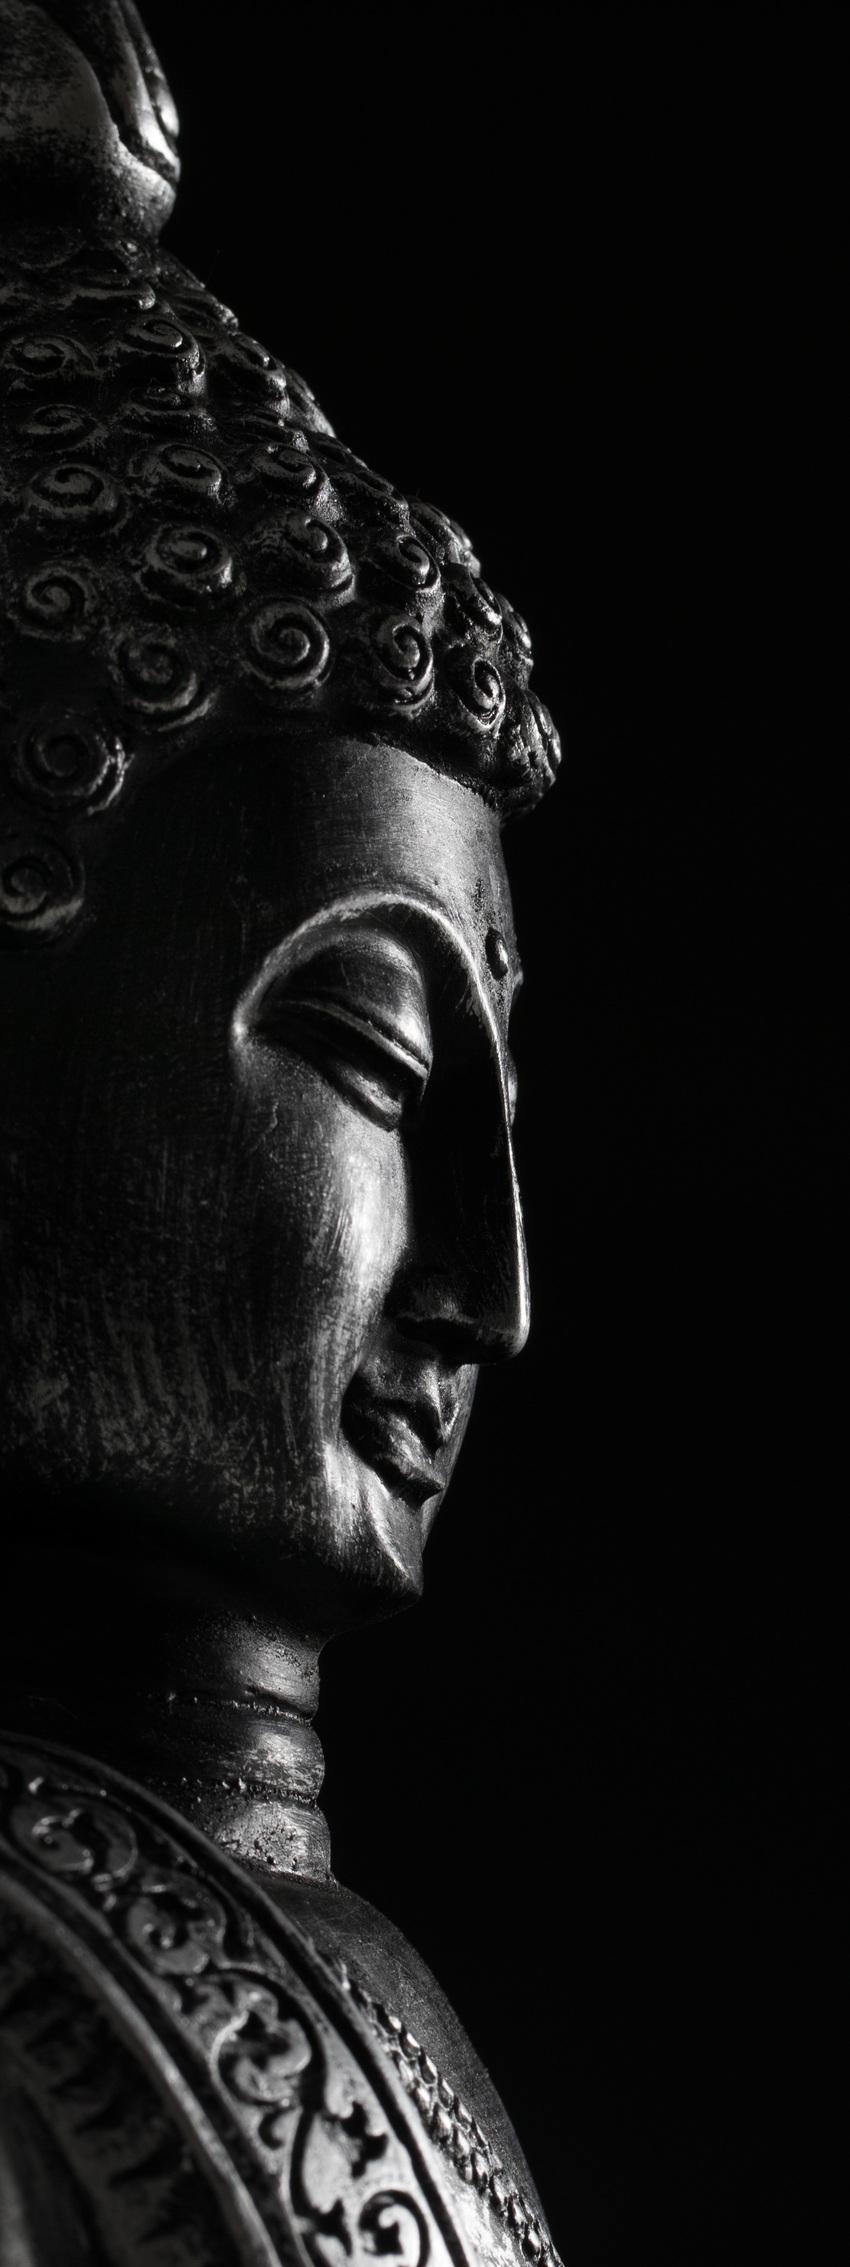 Buddha_11_17_012_02.jpg